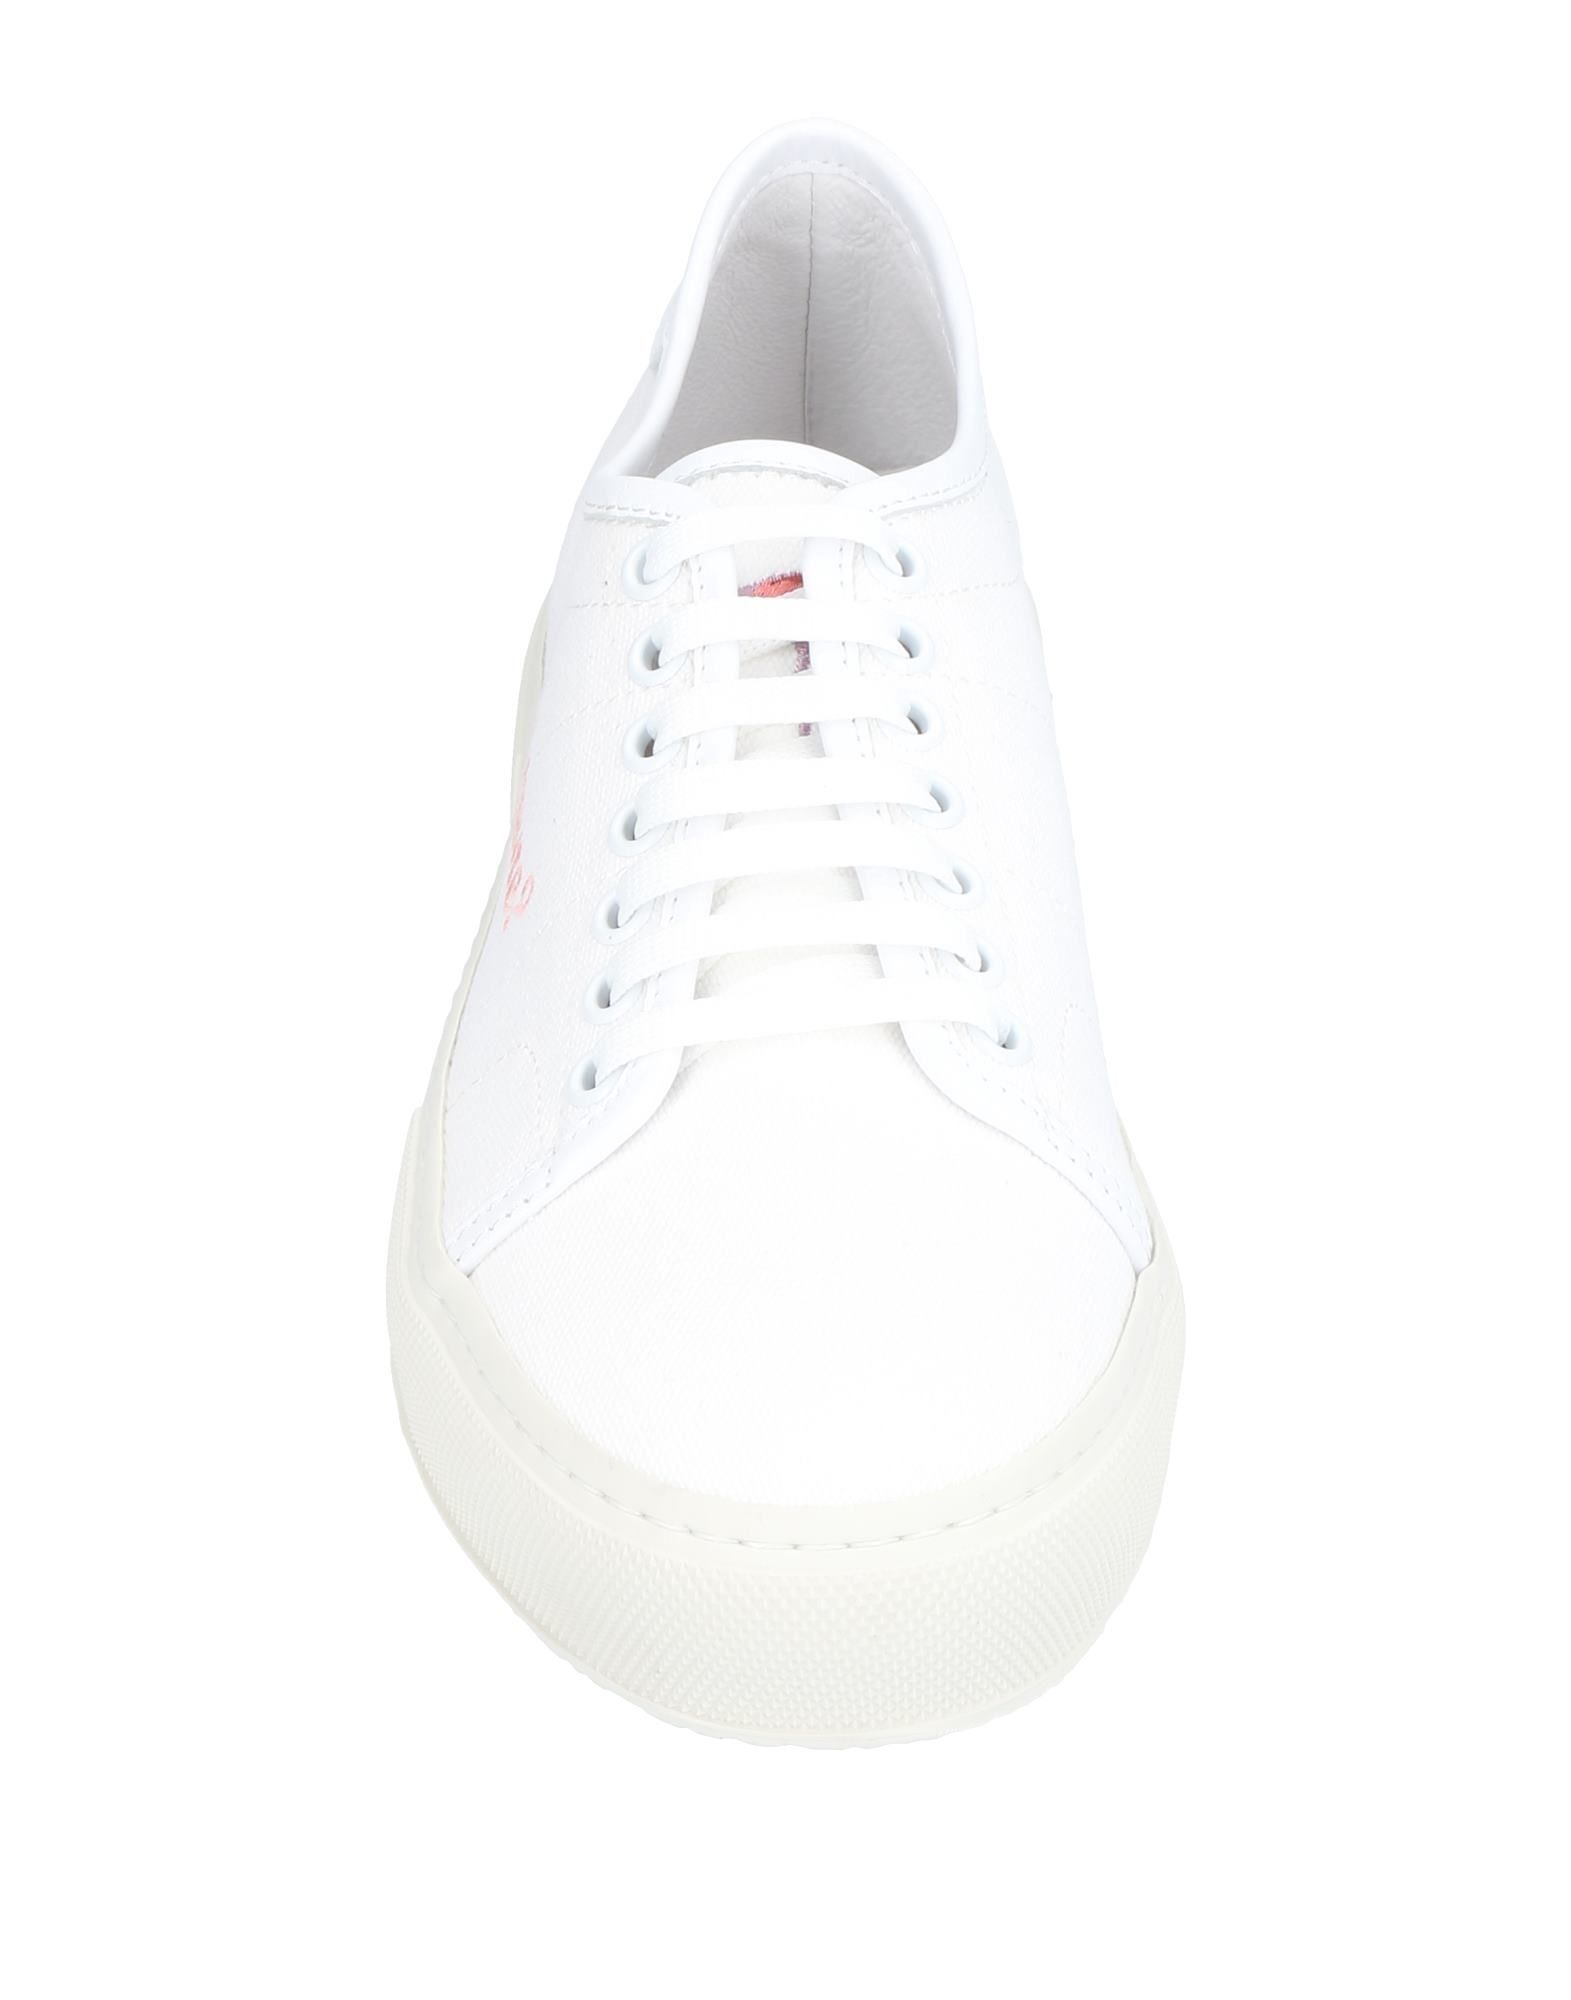 Stilvolle Damen billige Schuhe JoshuaS Sneakers Damen Stilvolle  11428886AI 0a6e32